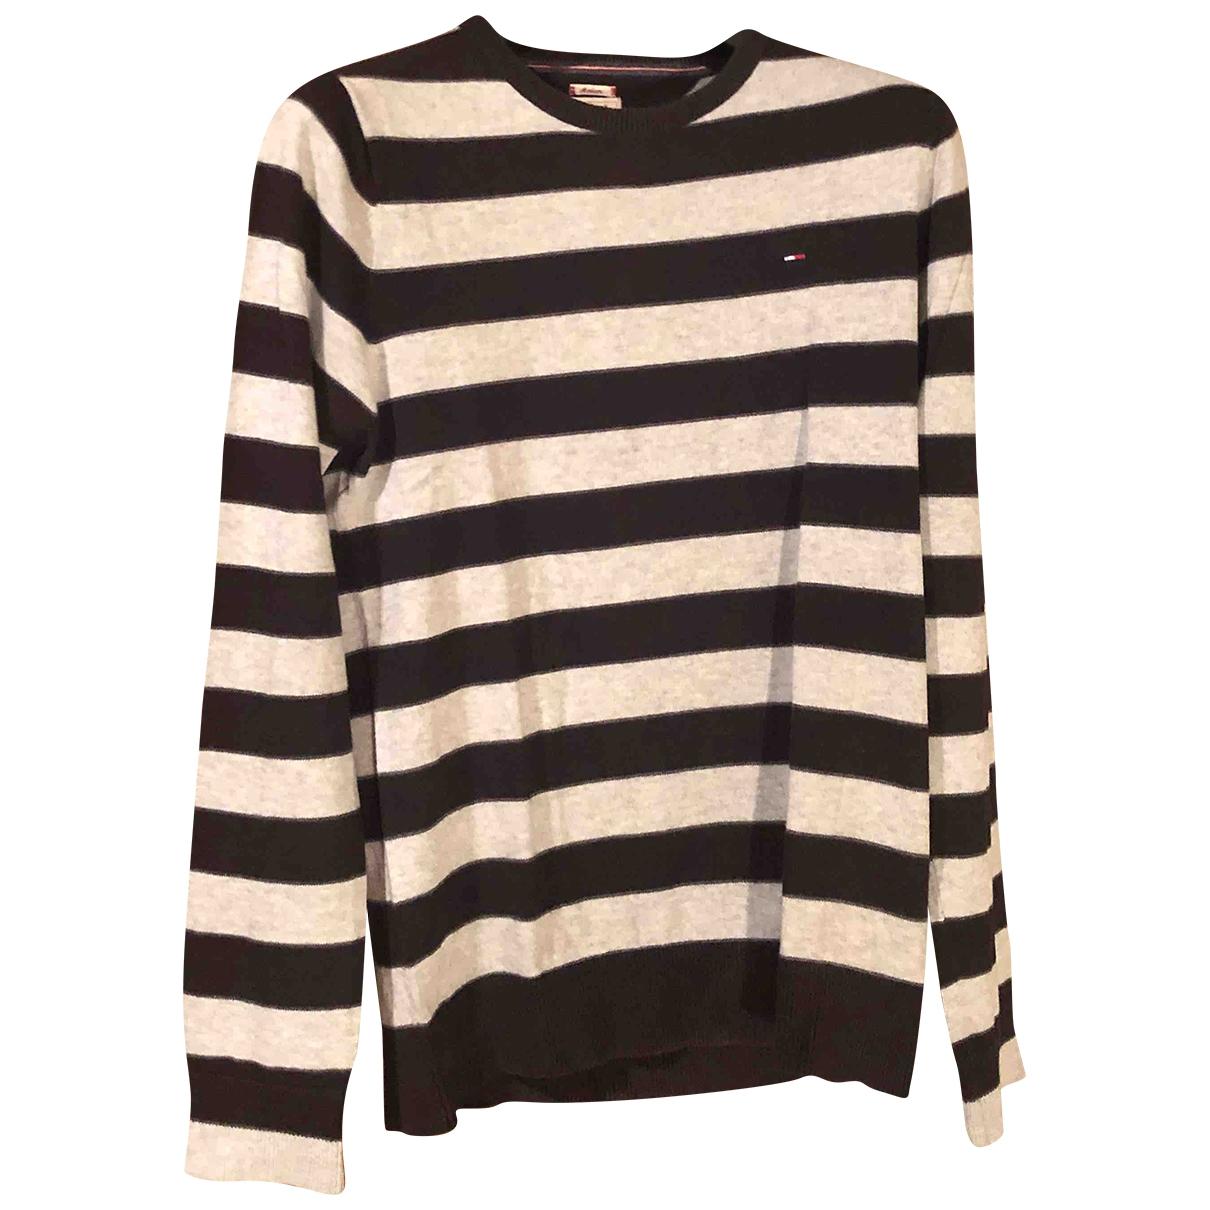 Tommy Hilfiger \N Black Cotton Knitwear & Sweatshirts for Men M International